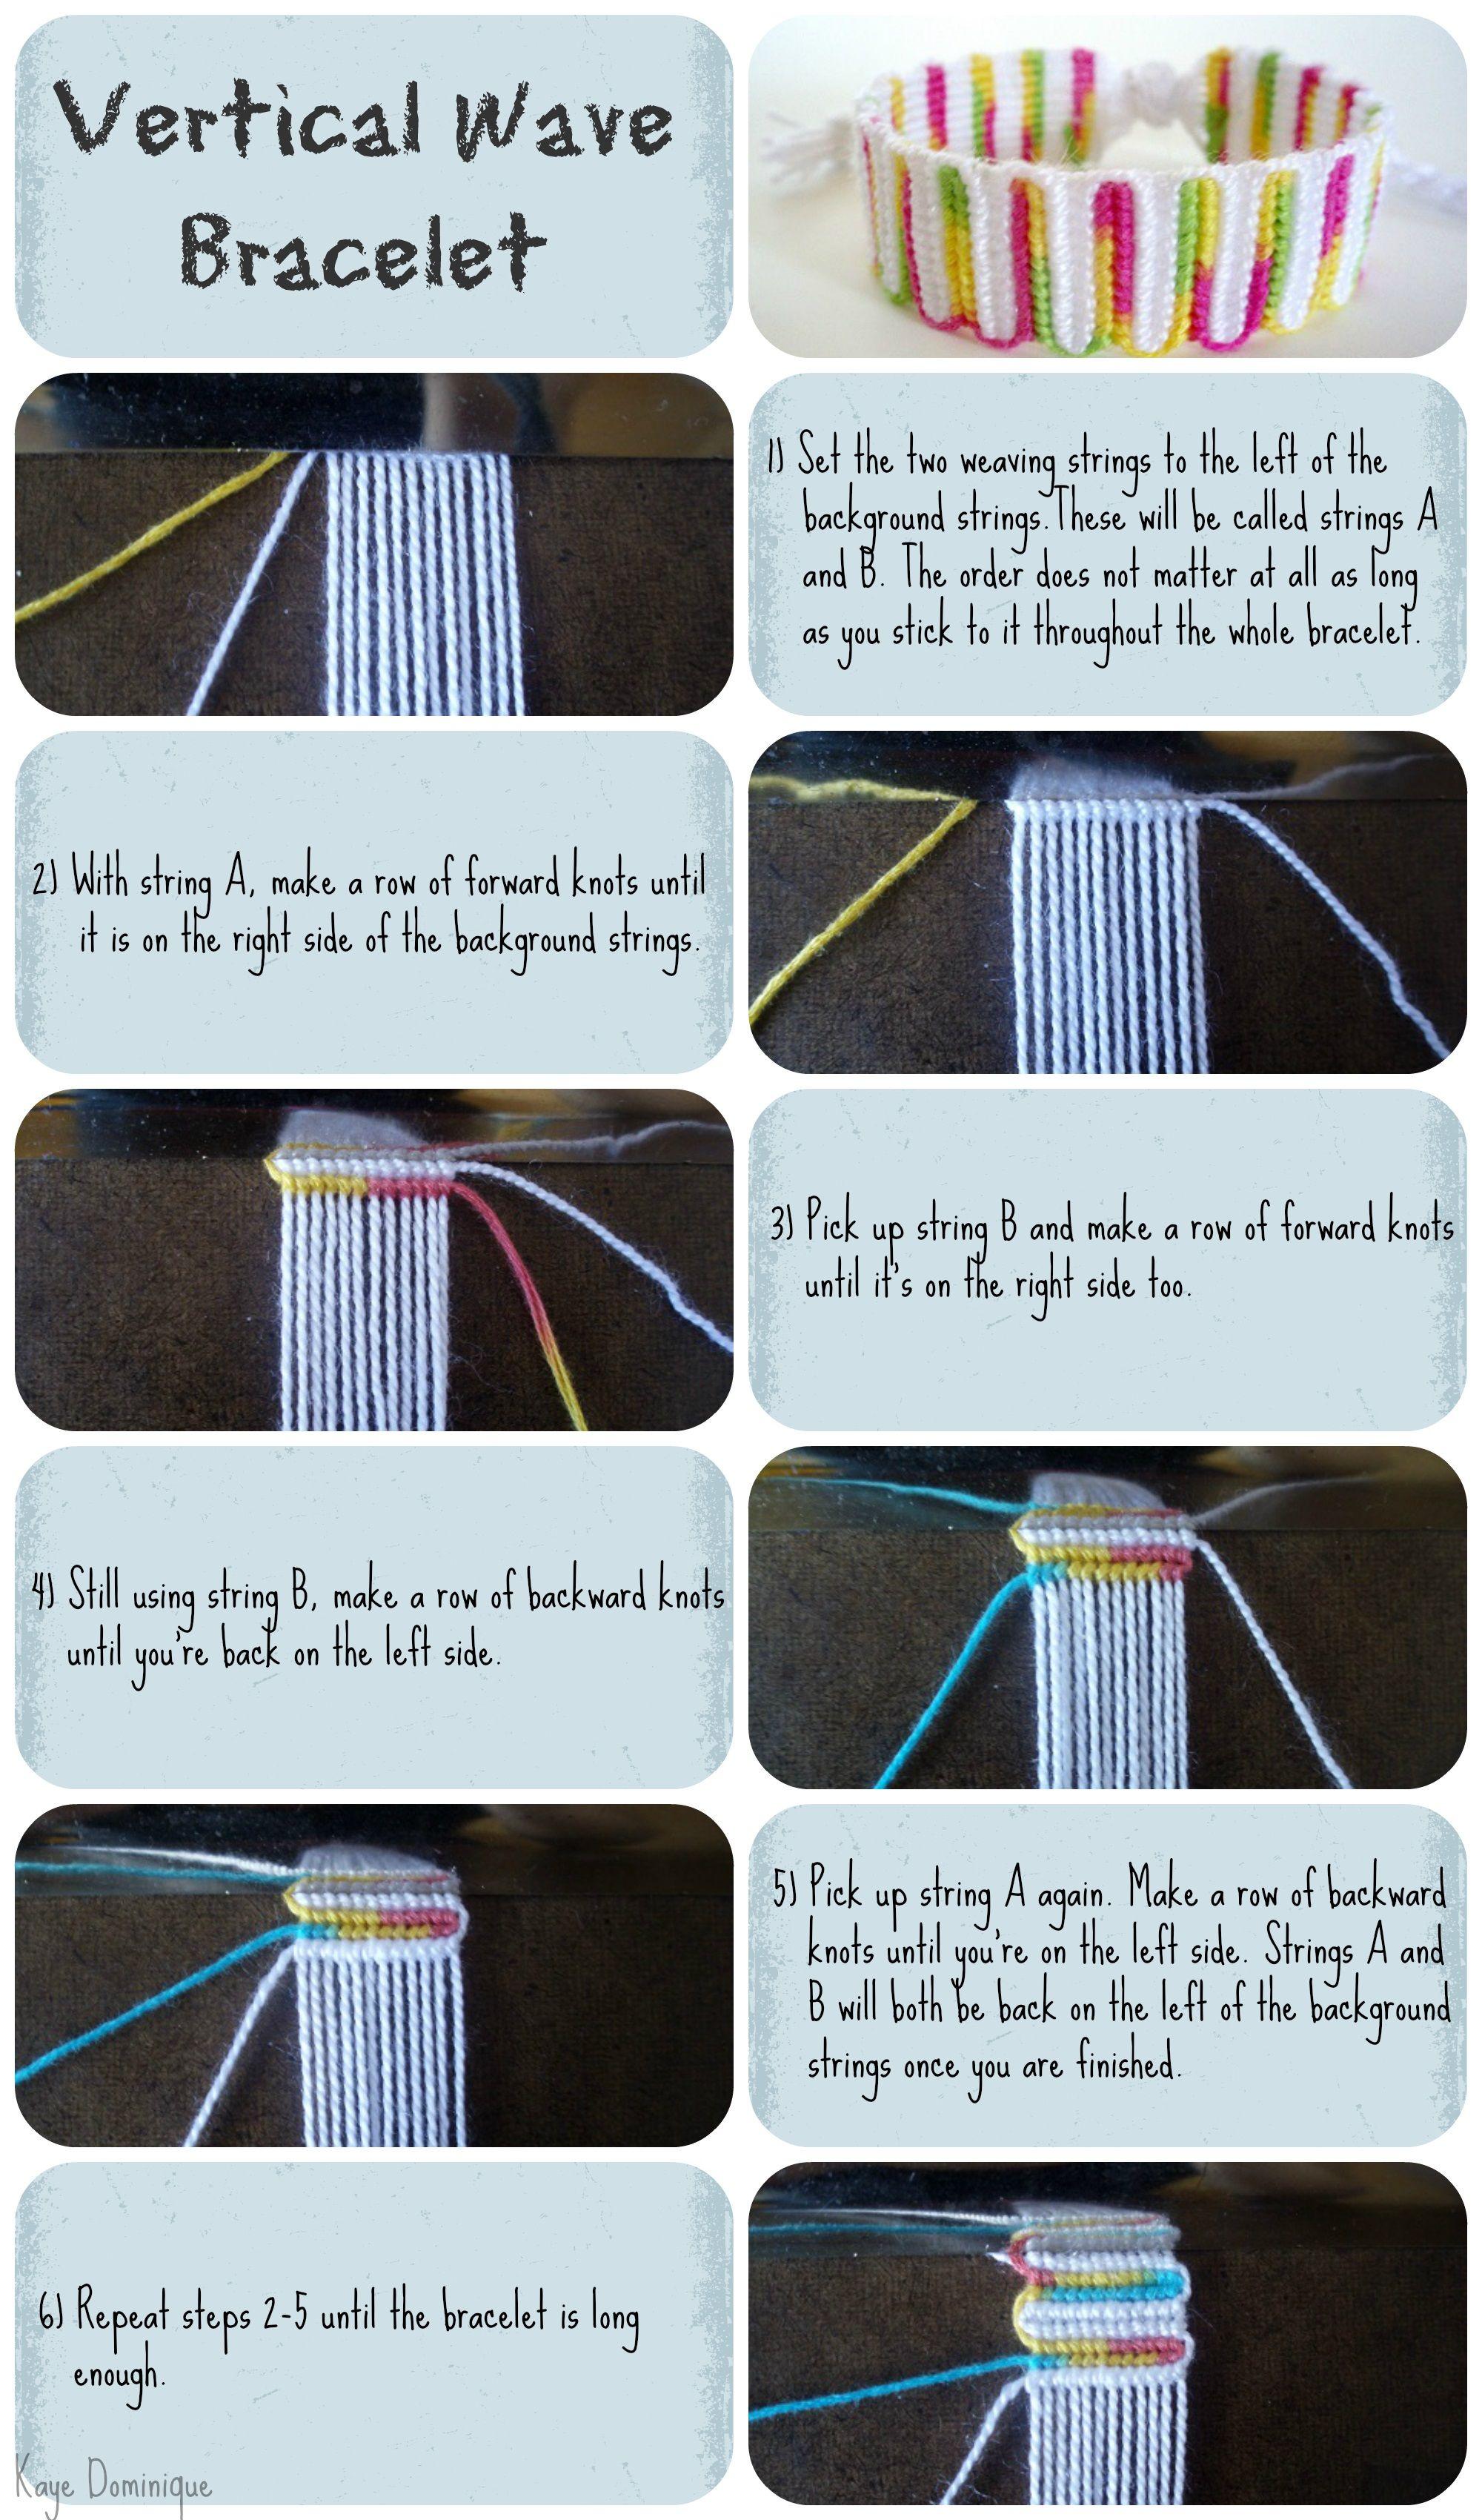 Vertical wave bracelet tutorial by chibishishi on deviantart